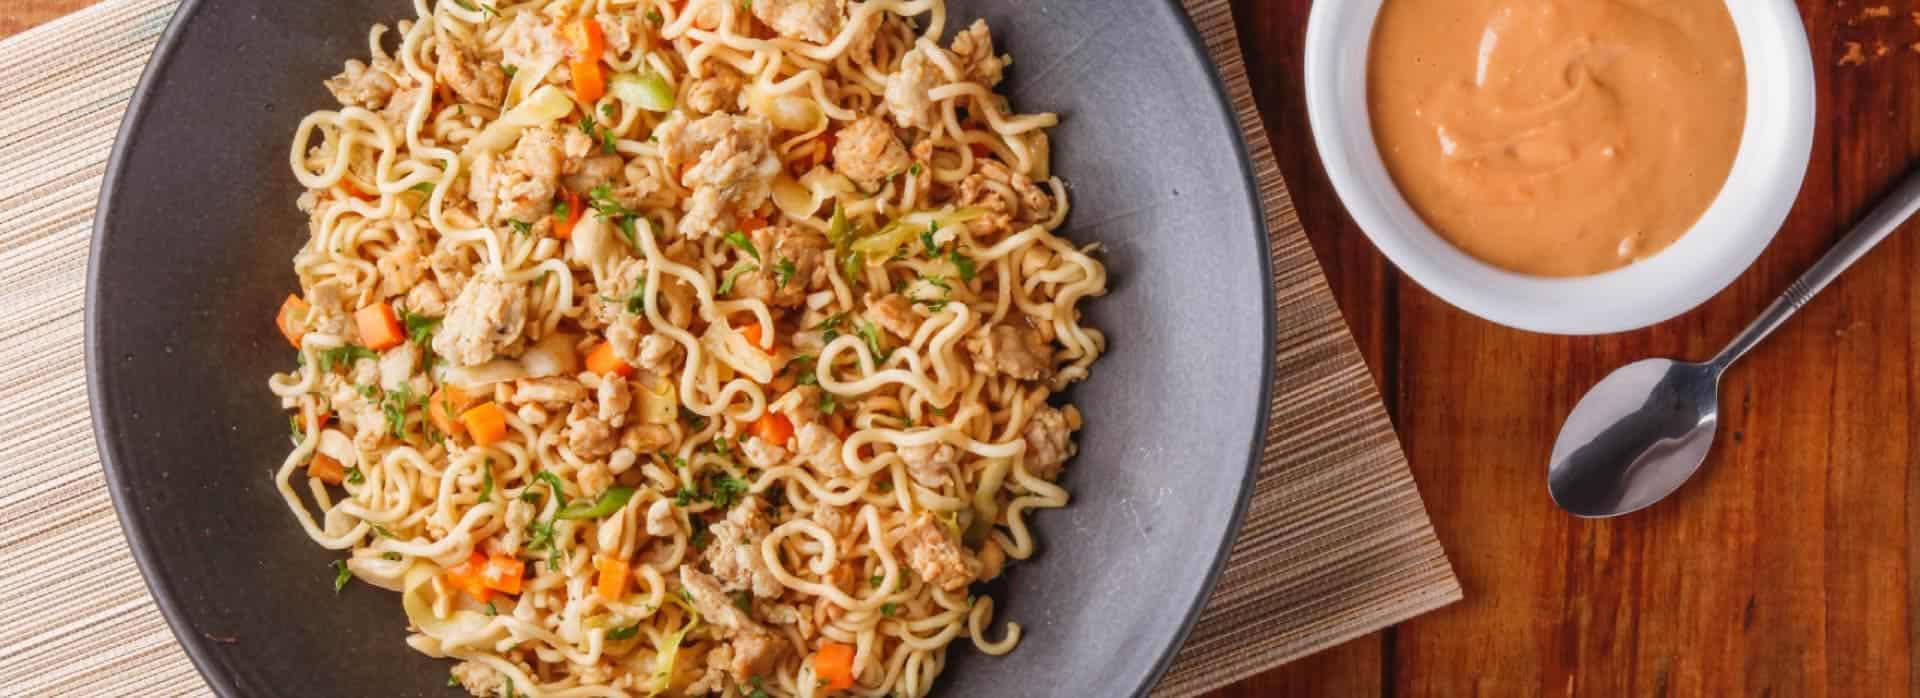 Receta Fideos con pollo en salsa de maní estilo oriental